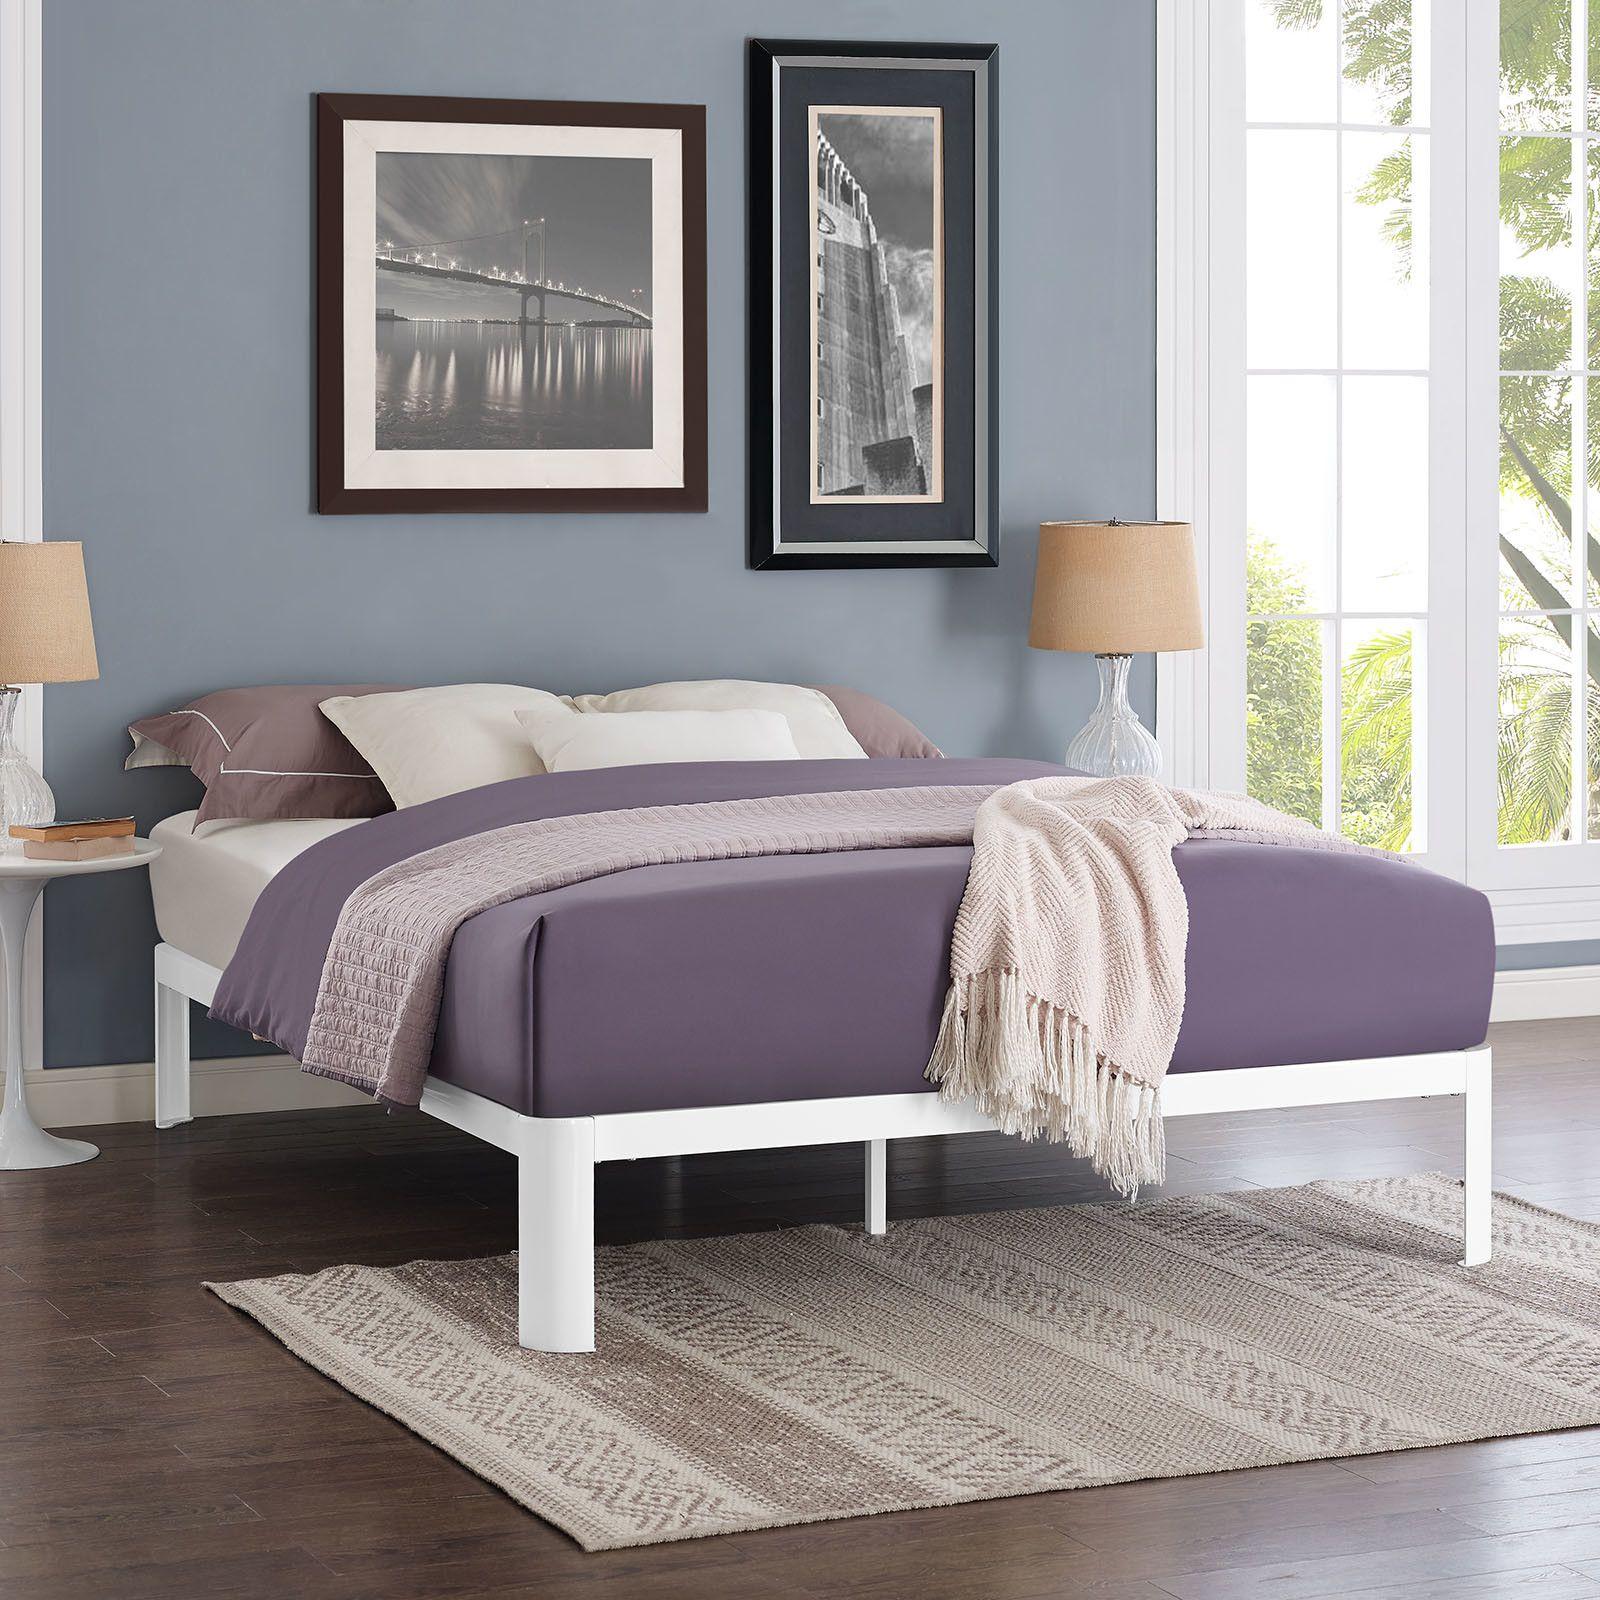 Customer Image Zoomed Steel bed frame, White bed frame